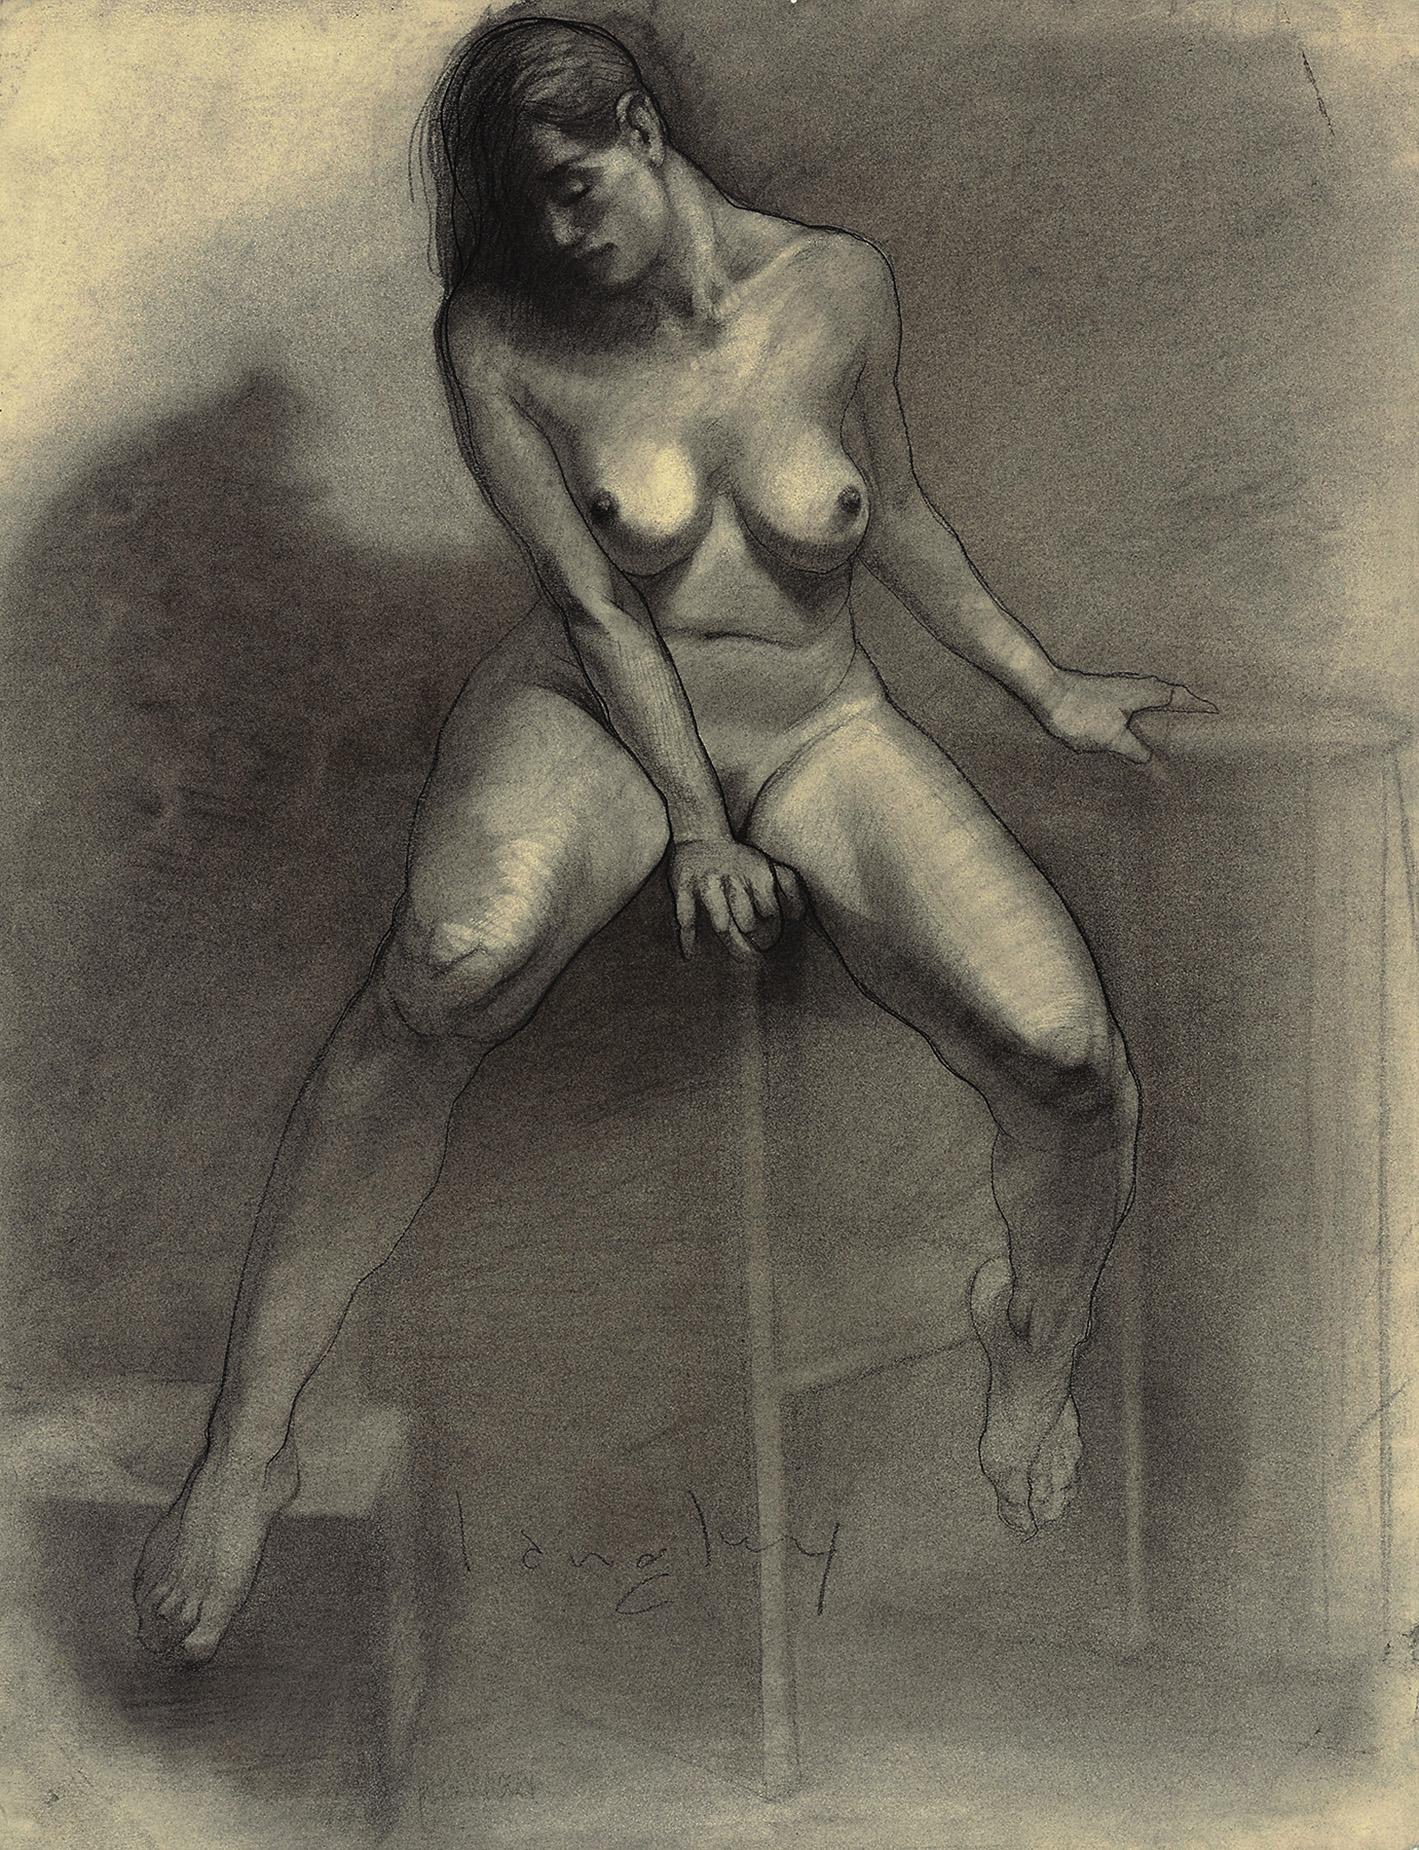 langley seated nude woman frontal.jpg